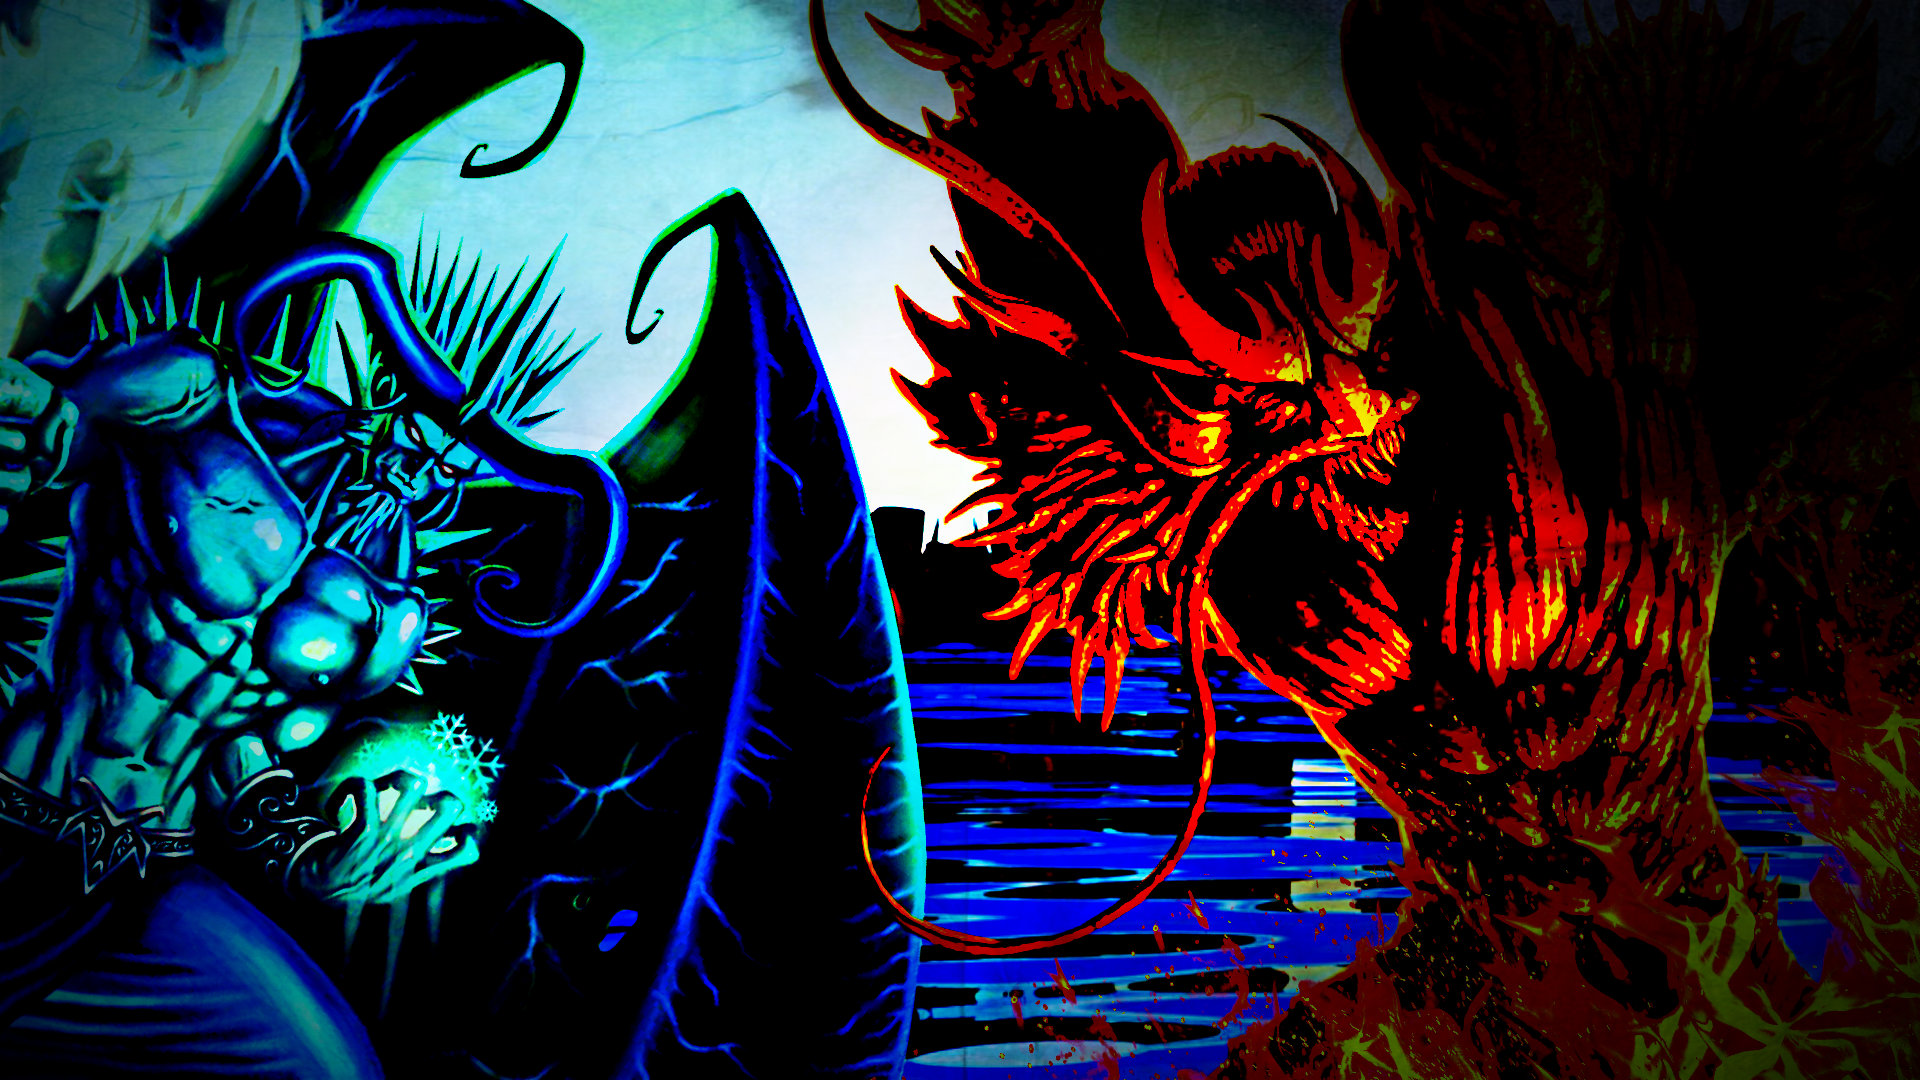 god vs devil wallpaper - photo #12